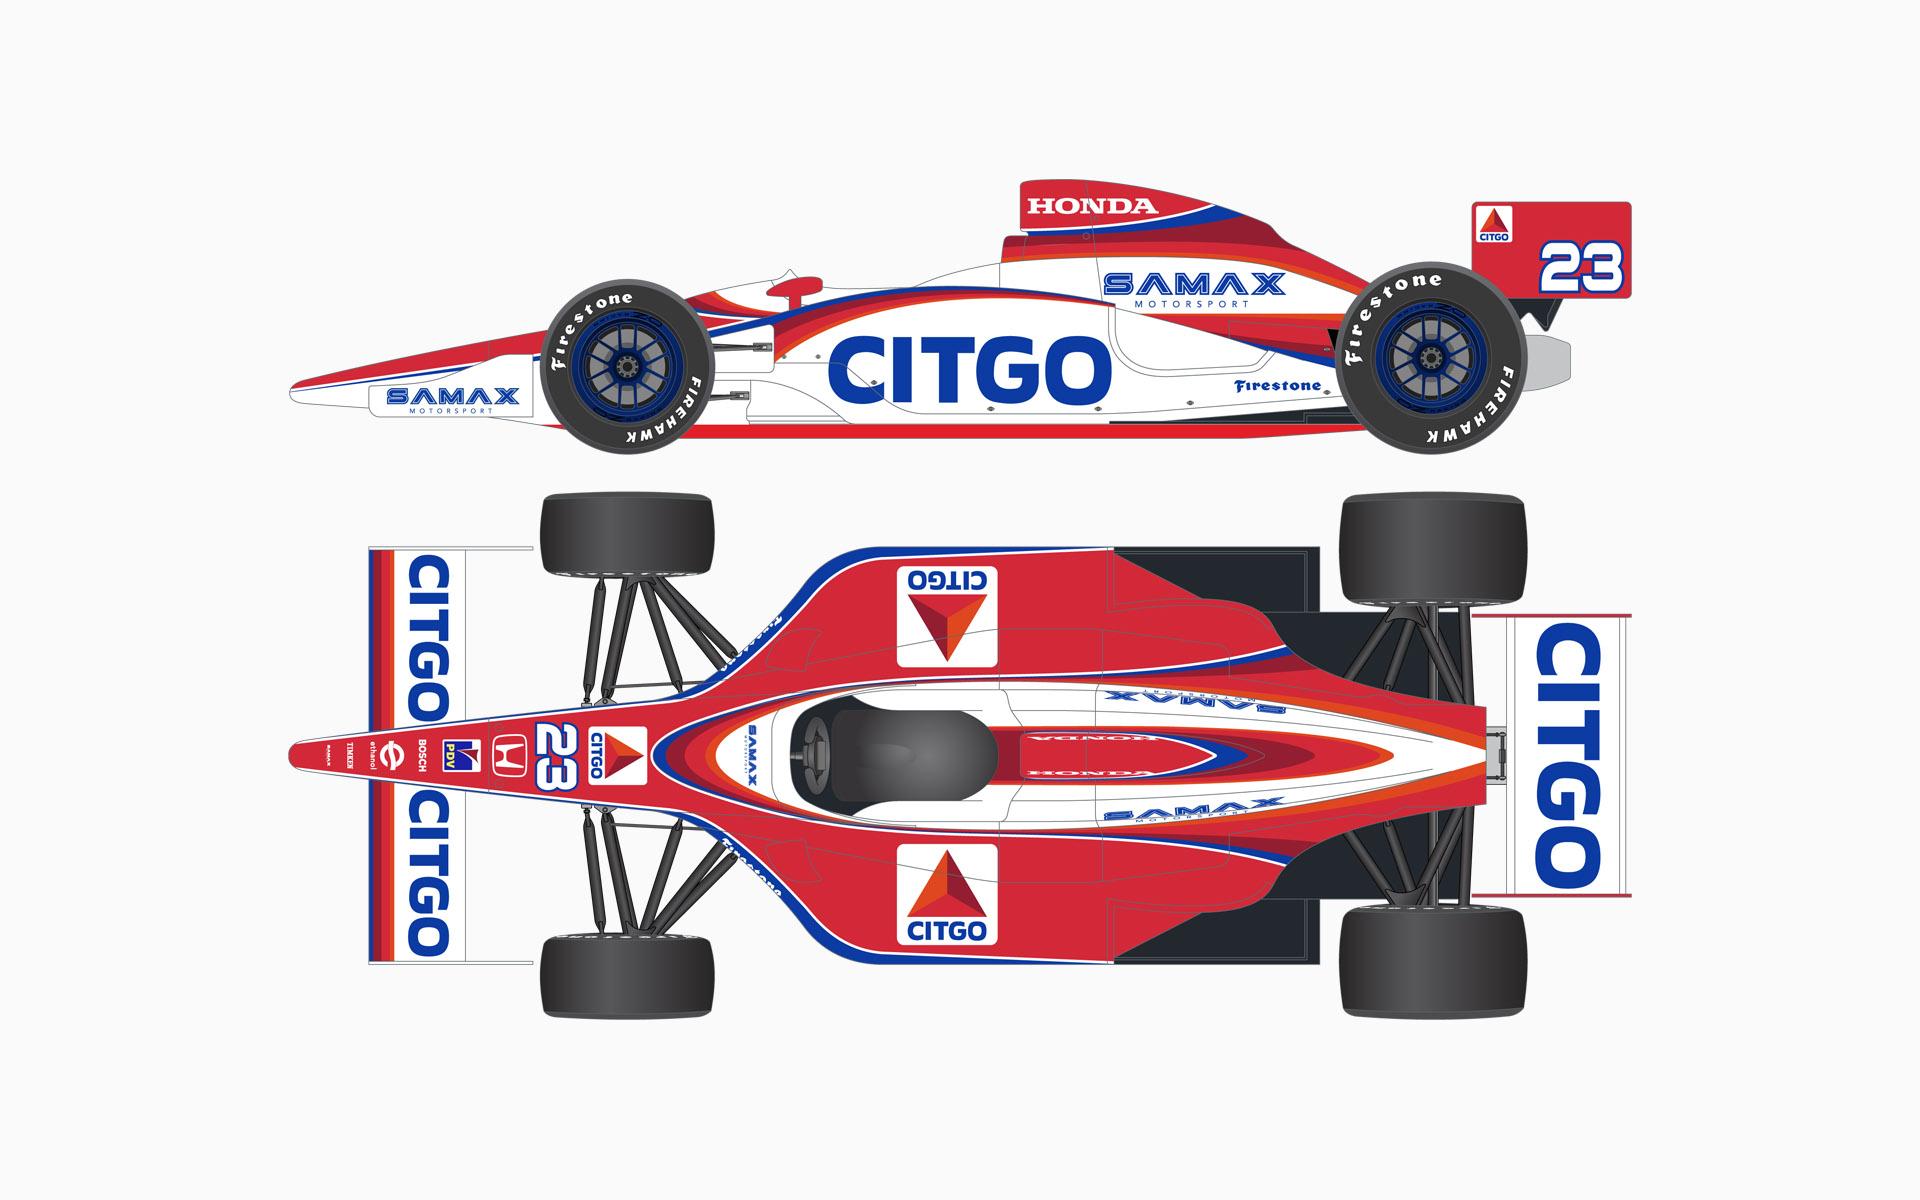 2007 Citgo Racing Dallara Honda IndyCar Livery Elevations